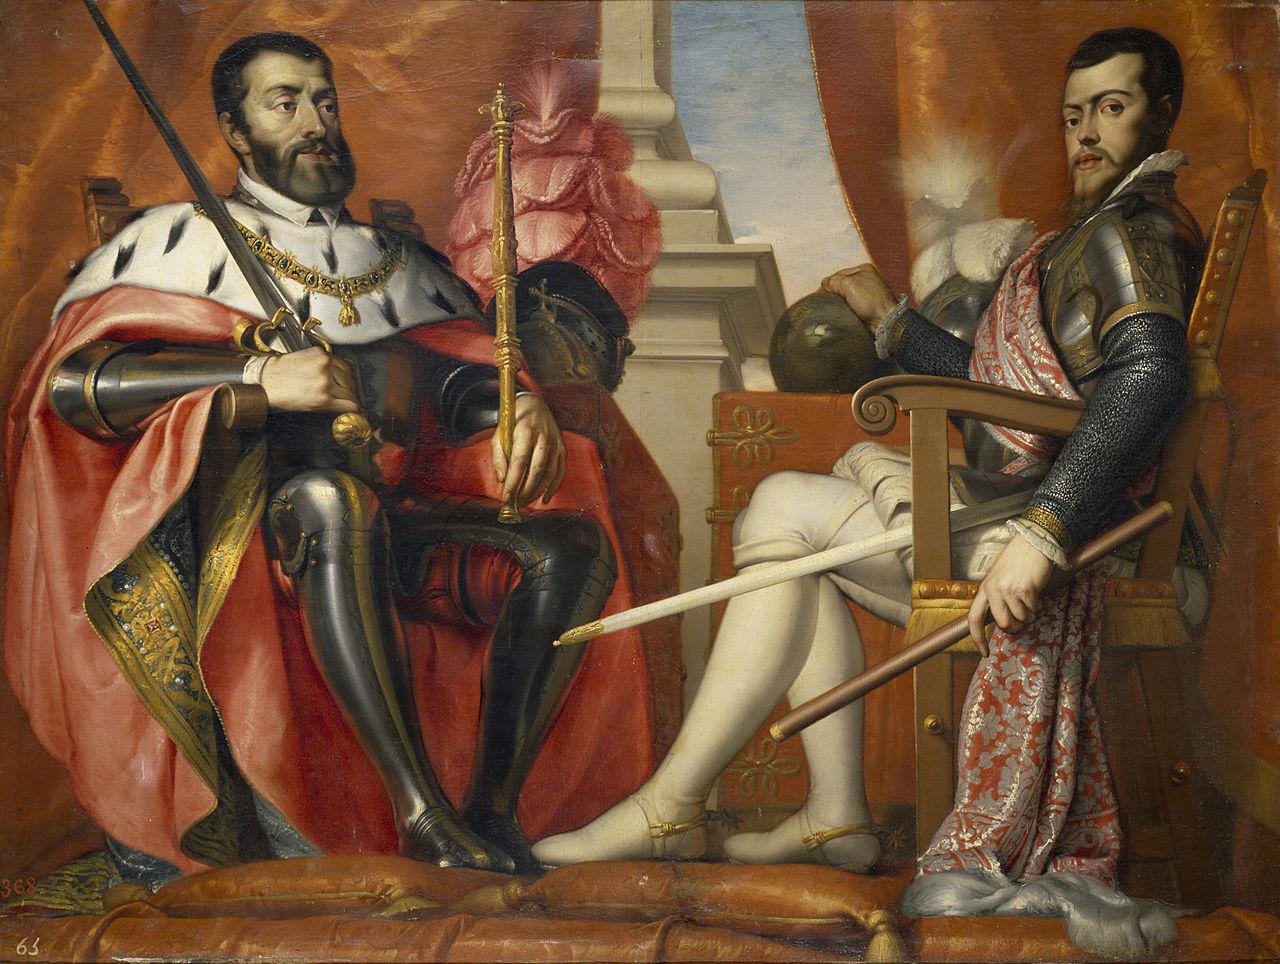 http://upload.wikimedia.org/wikipedia/commons/thumb/d/d1/Carlos_I_y_Felipe_II.jpg/1280px-Carlos_I_y_Felipe_II.jpg